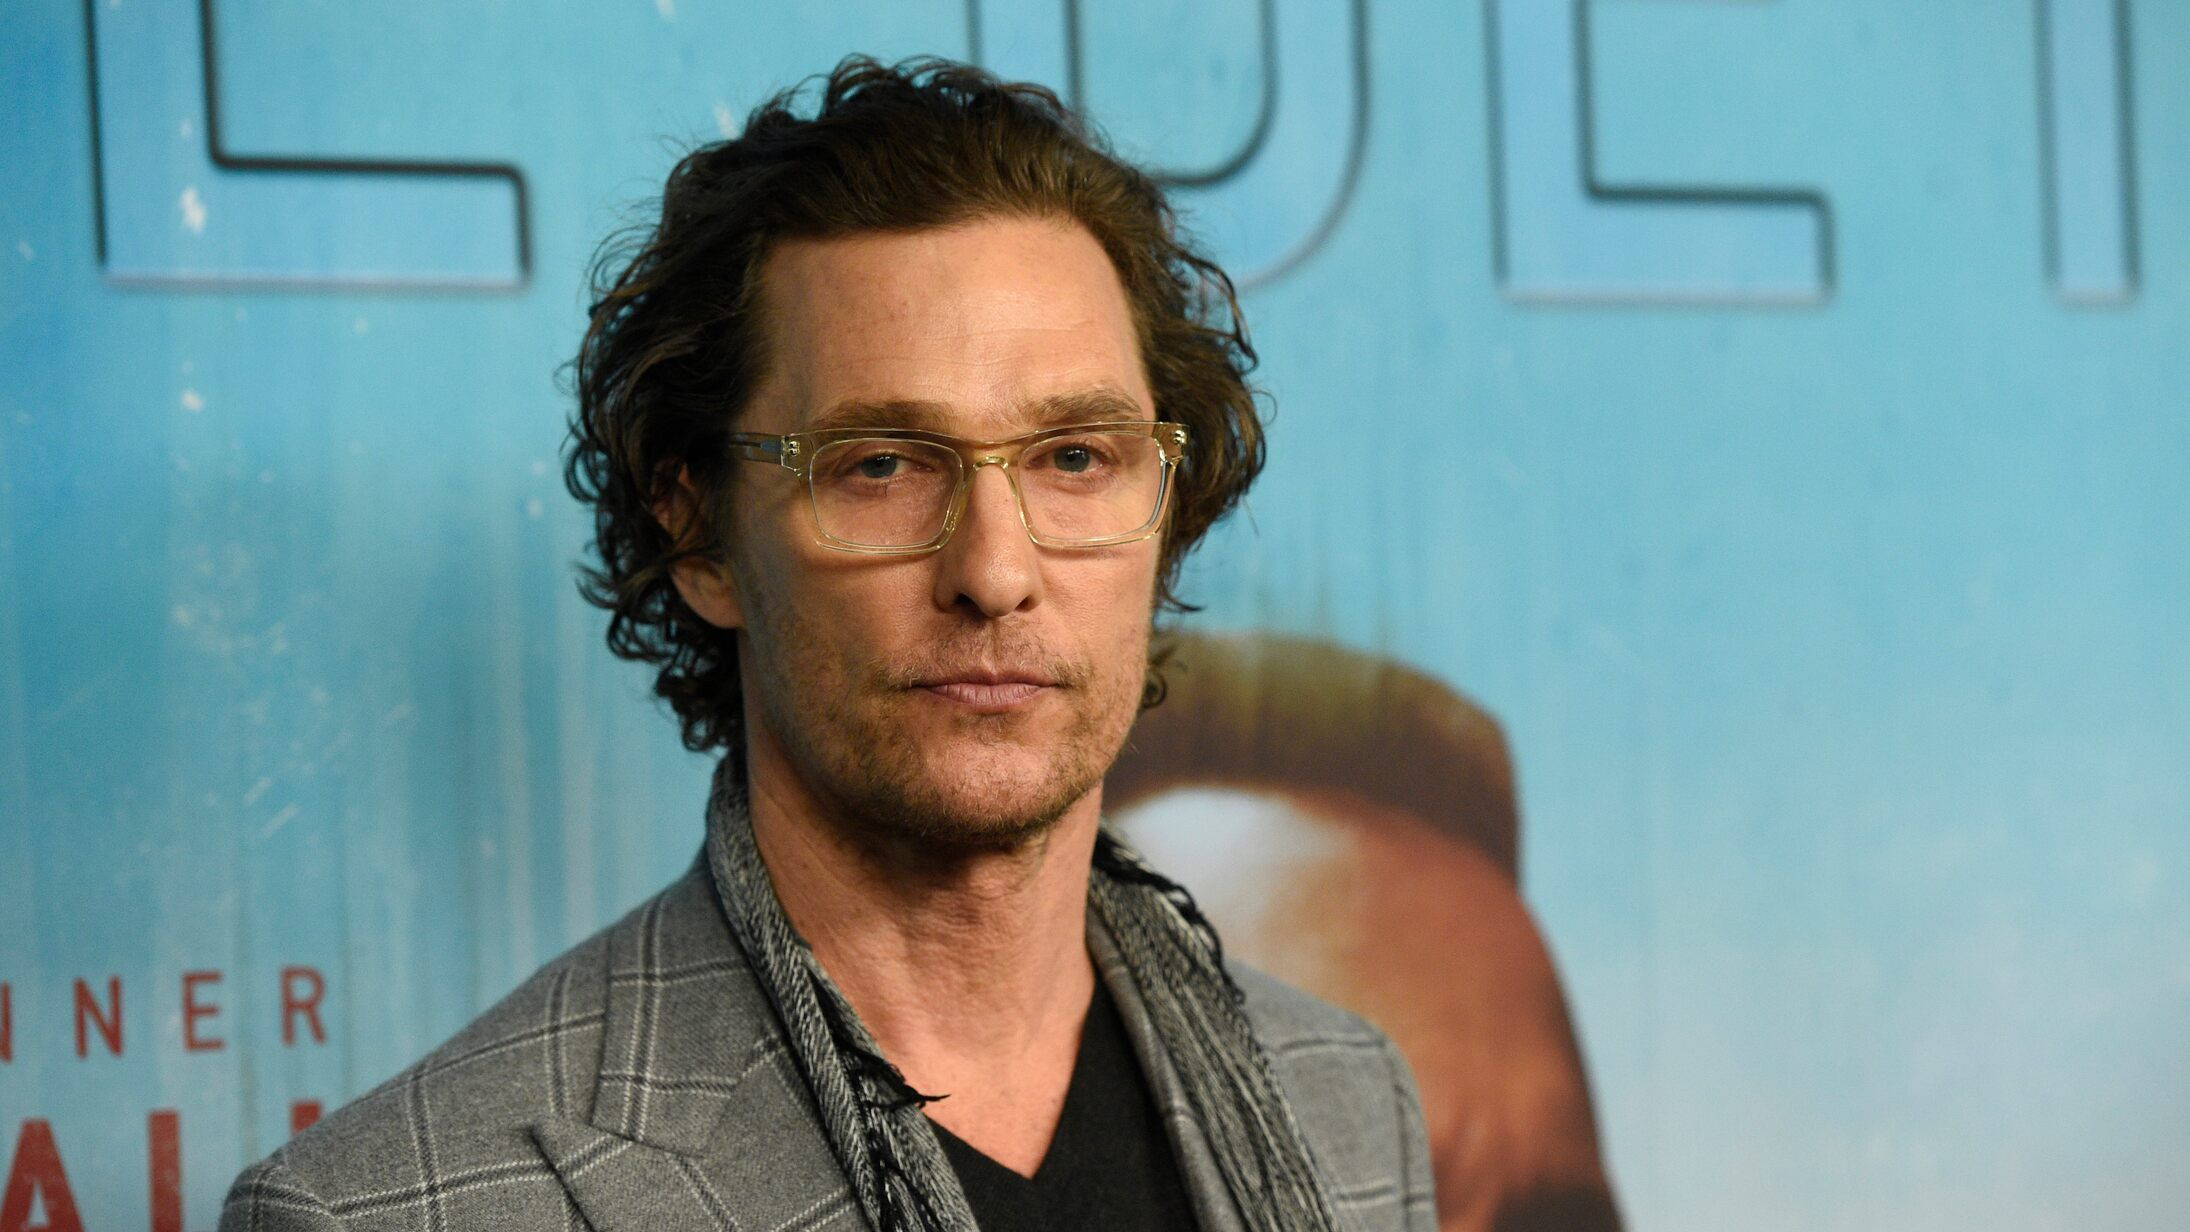 Matthew McConaughey to film professor at University